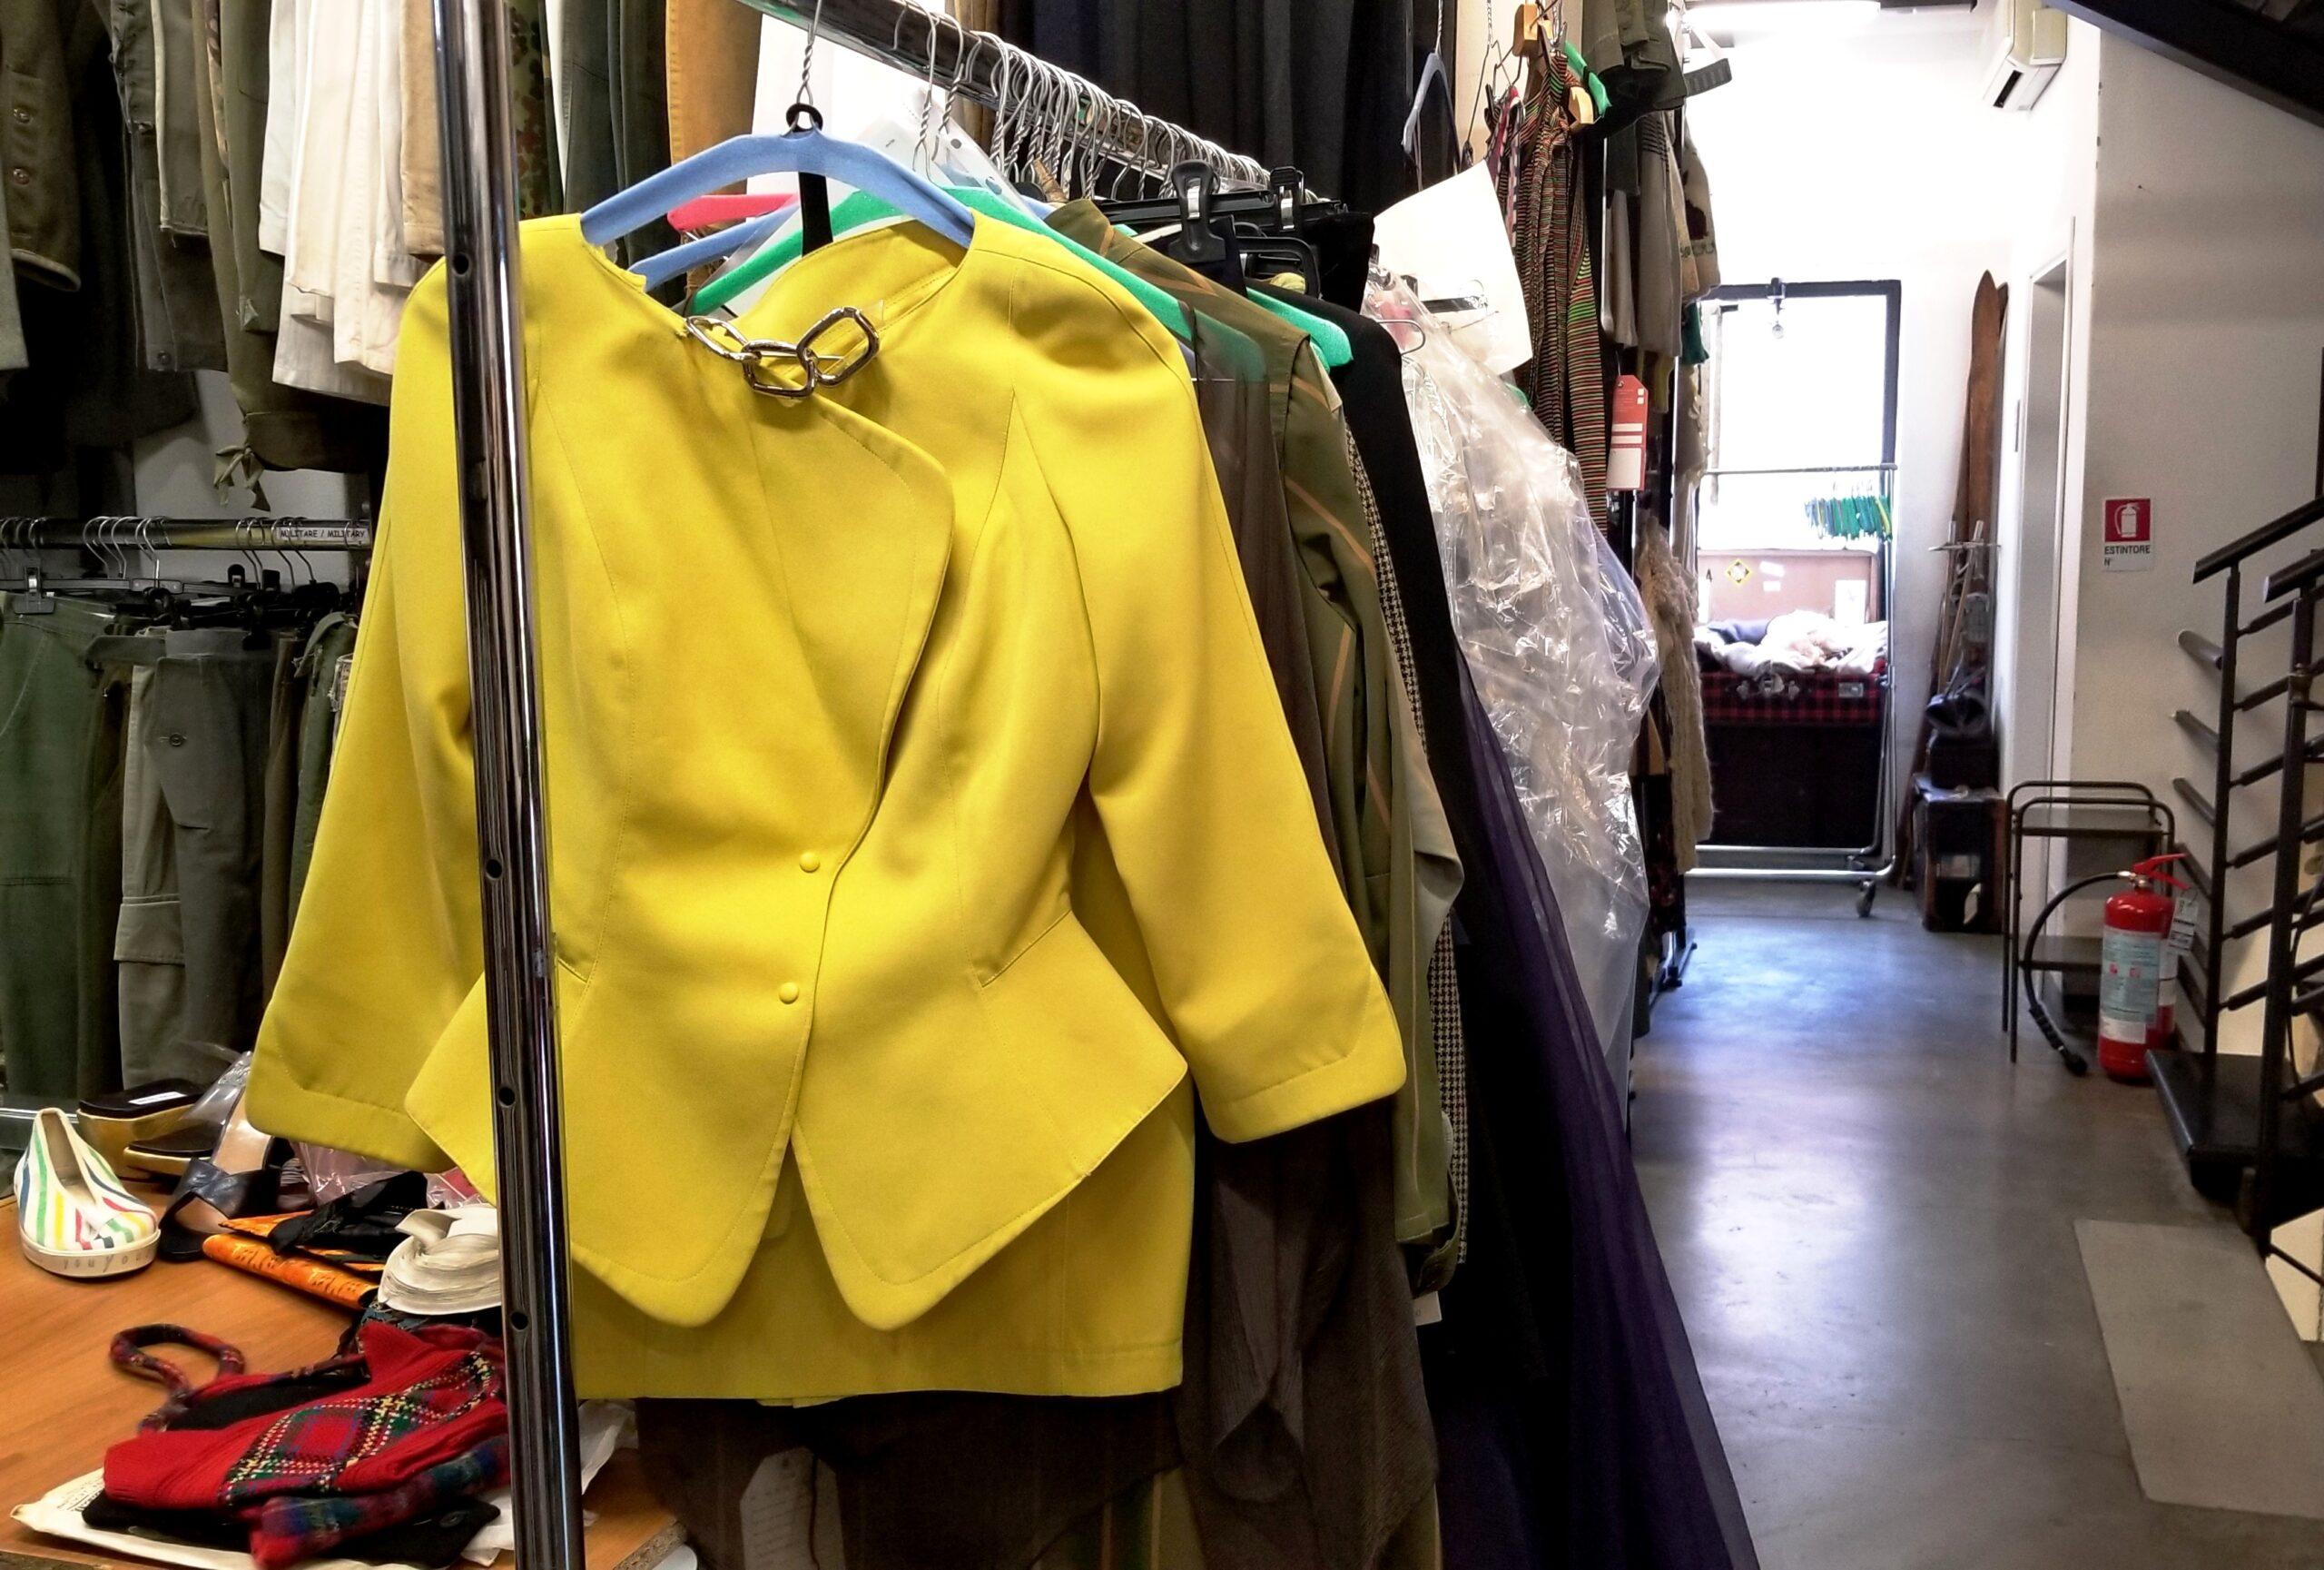 Angelo Caroli, House of Vintage, lugo, italy, helen siwak, ecoluxluv, folioyvr, vancouver, vancity, bc, yvr, vintage fashion, travel